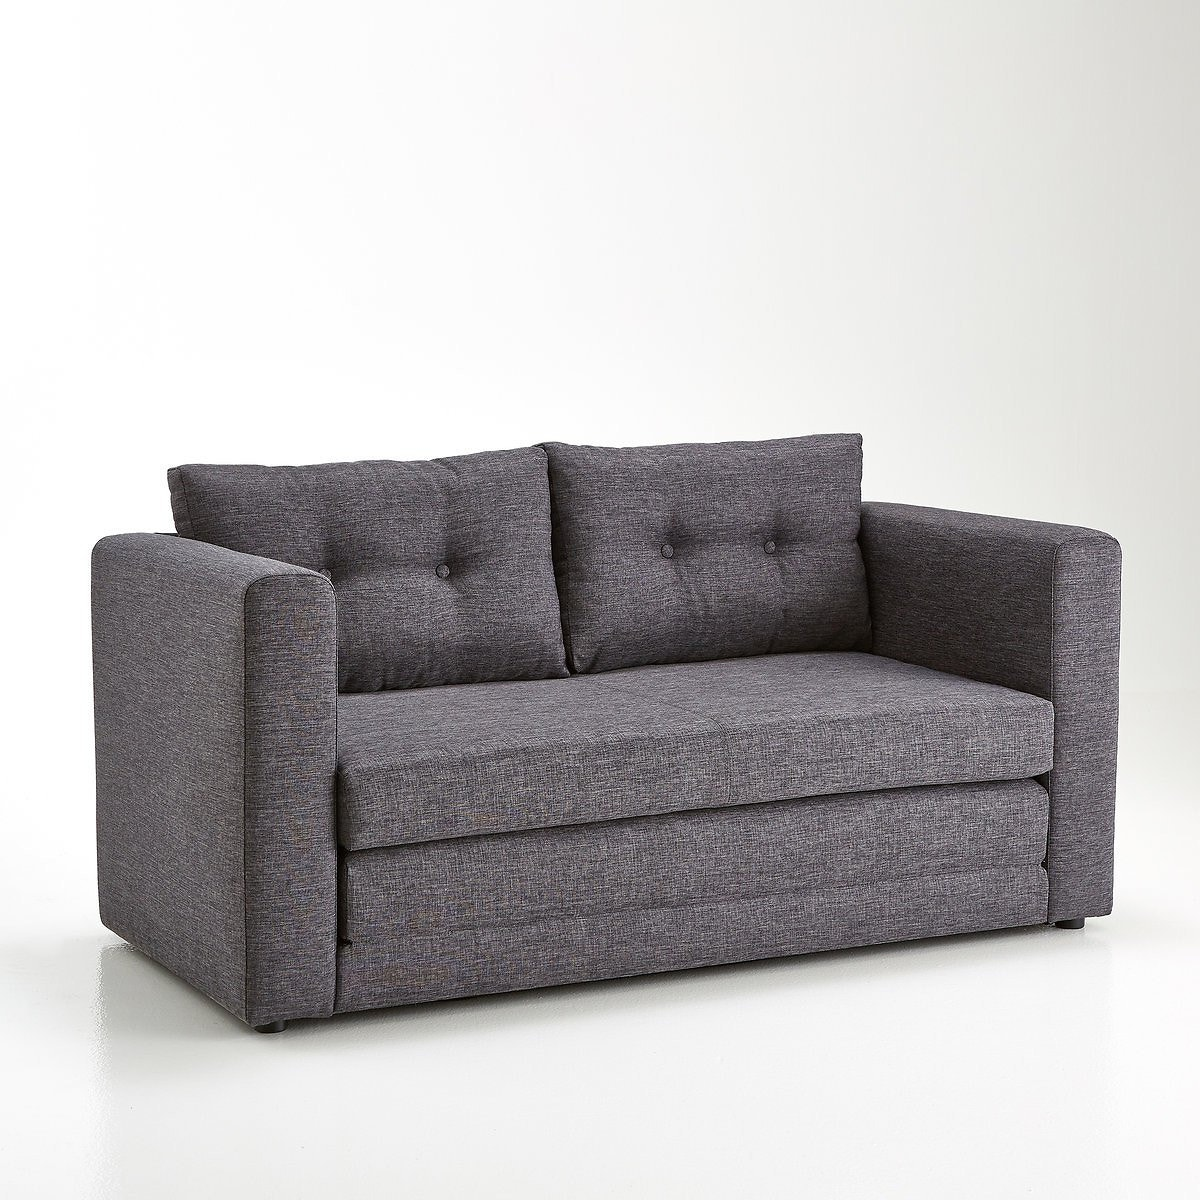 Sofá cama de estilo neoindustrial